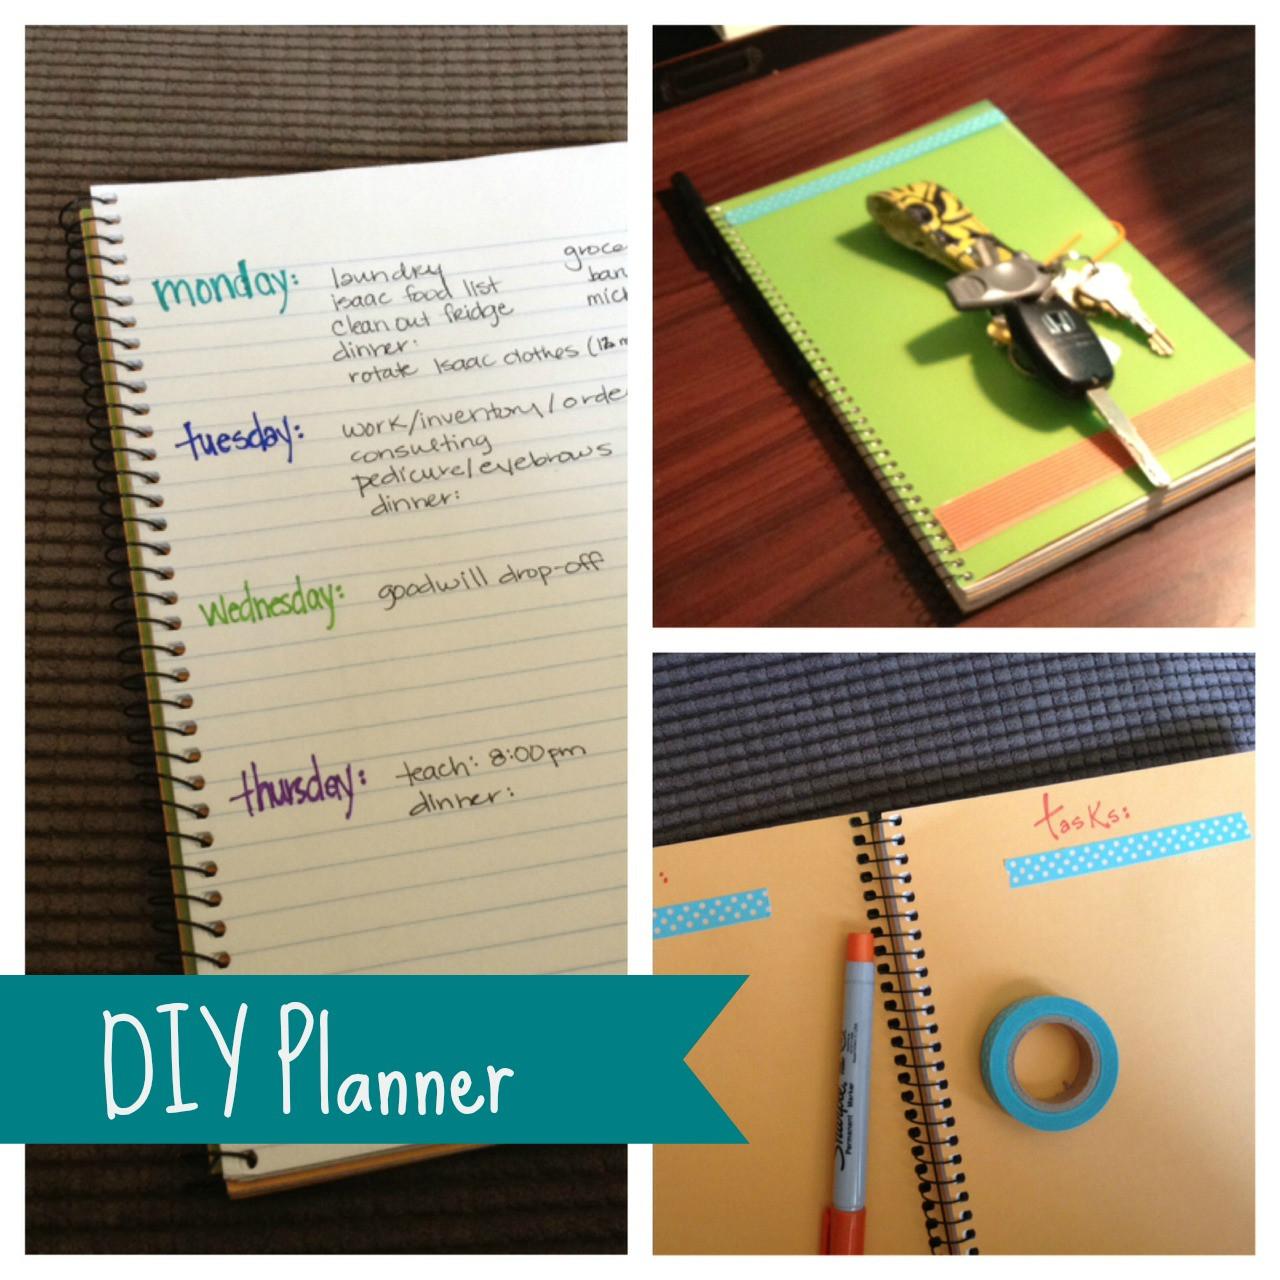 DIY Planner From Notebook  My DIY Planner